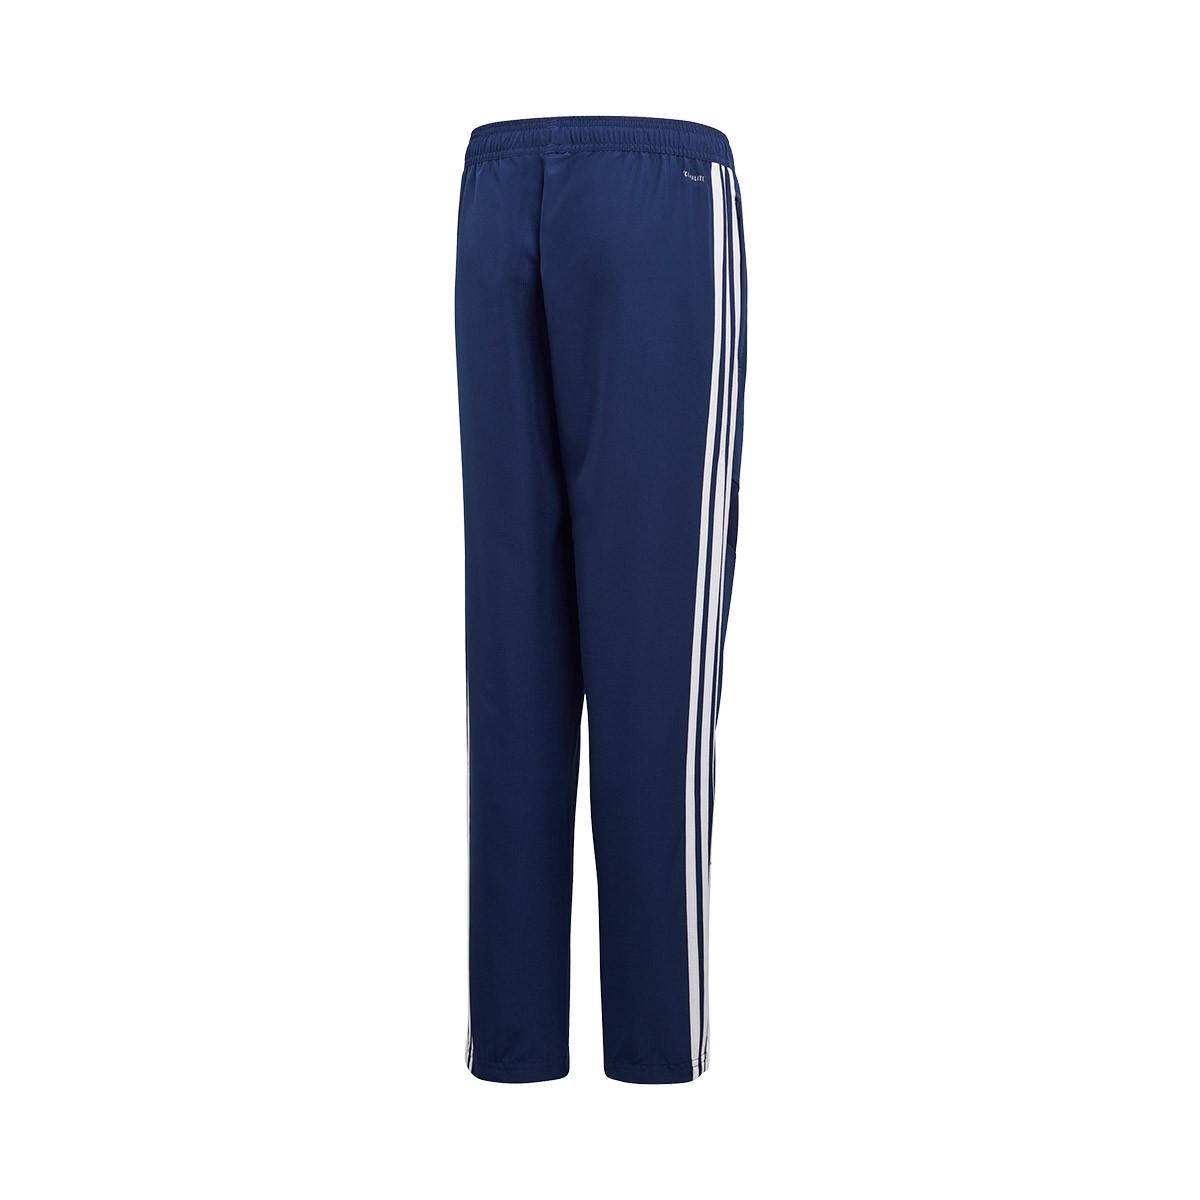 Adidas Tiro 19 Woven Pants Junior